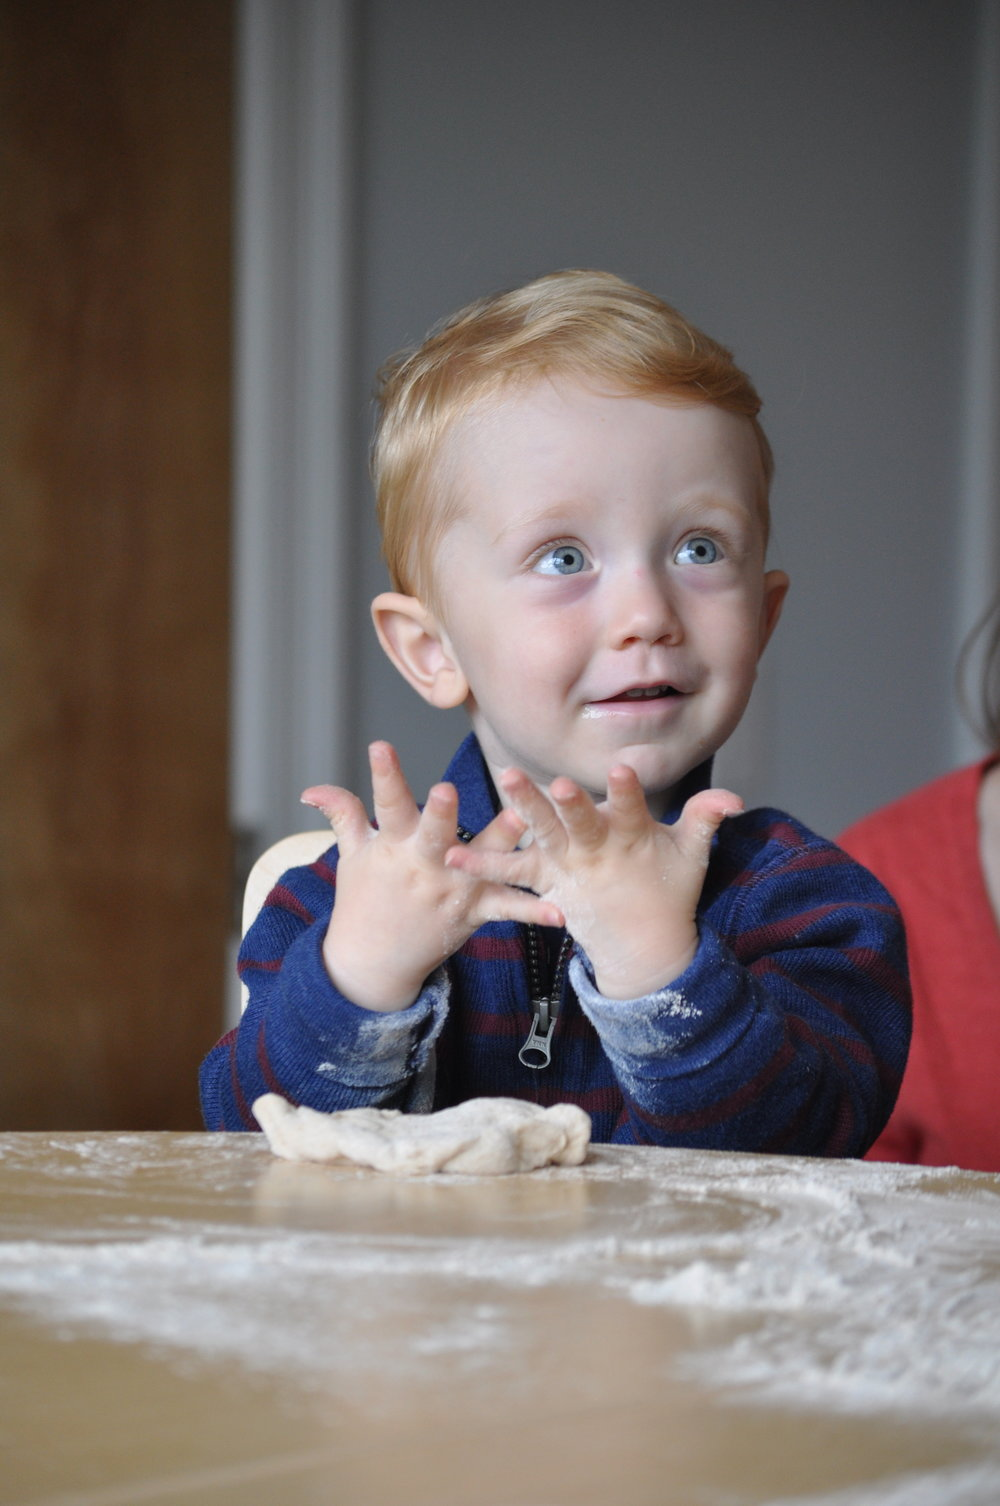 Newburyport Toddler Breadmaking Class